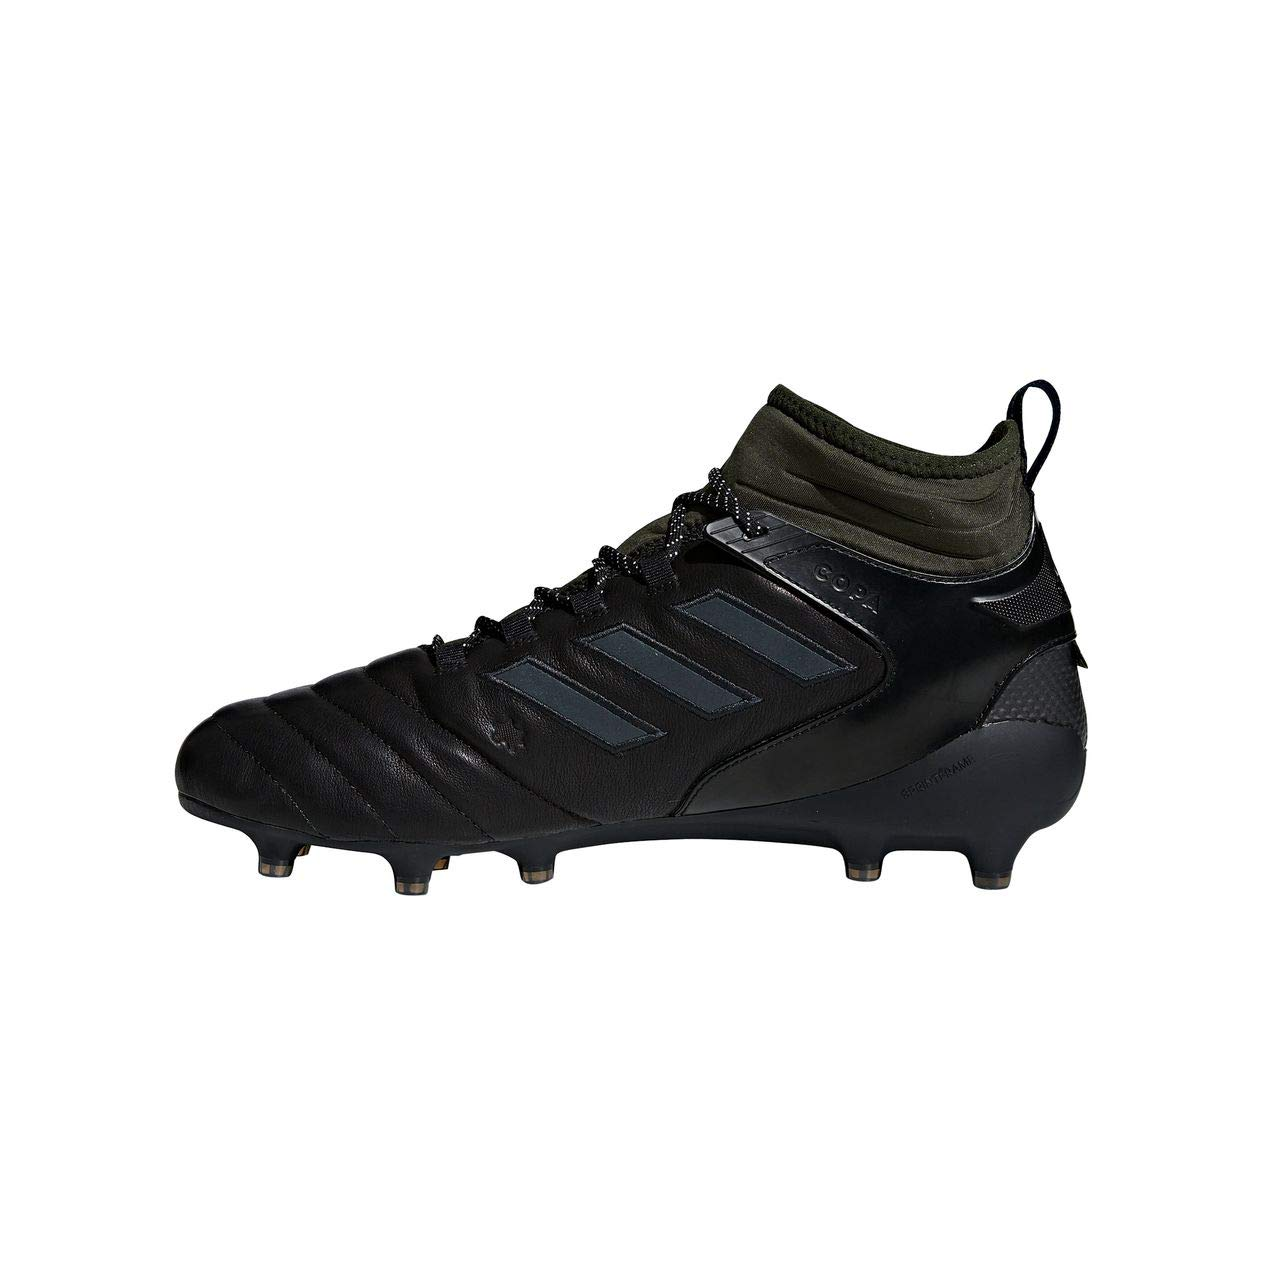 Adidas Copa Mid Fg GTX - cschwarz dgsogr Legink